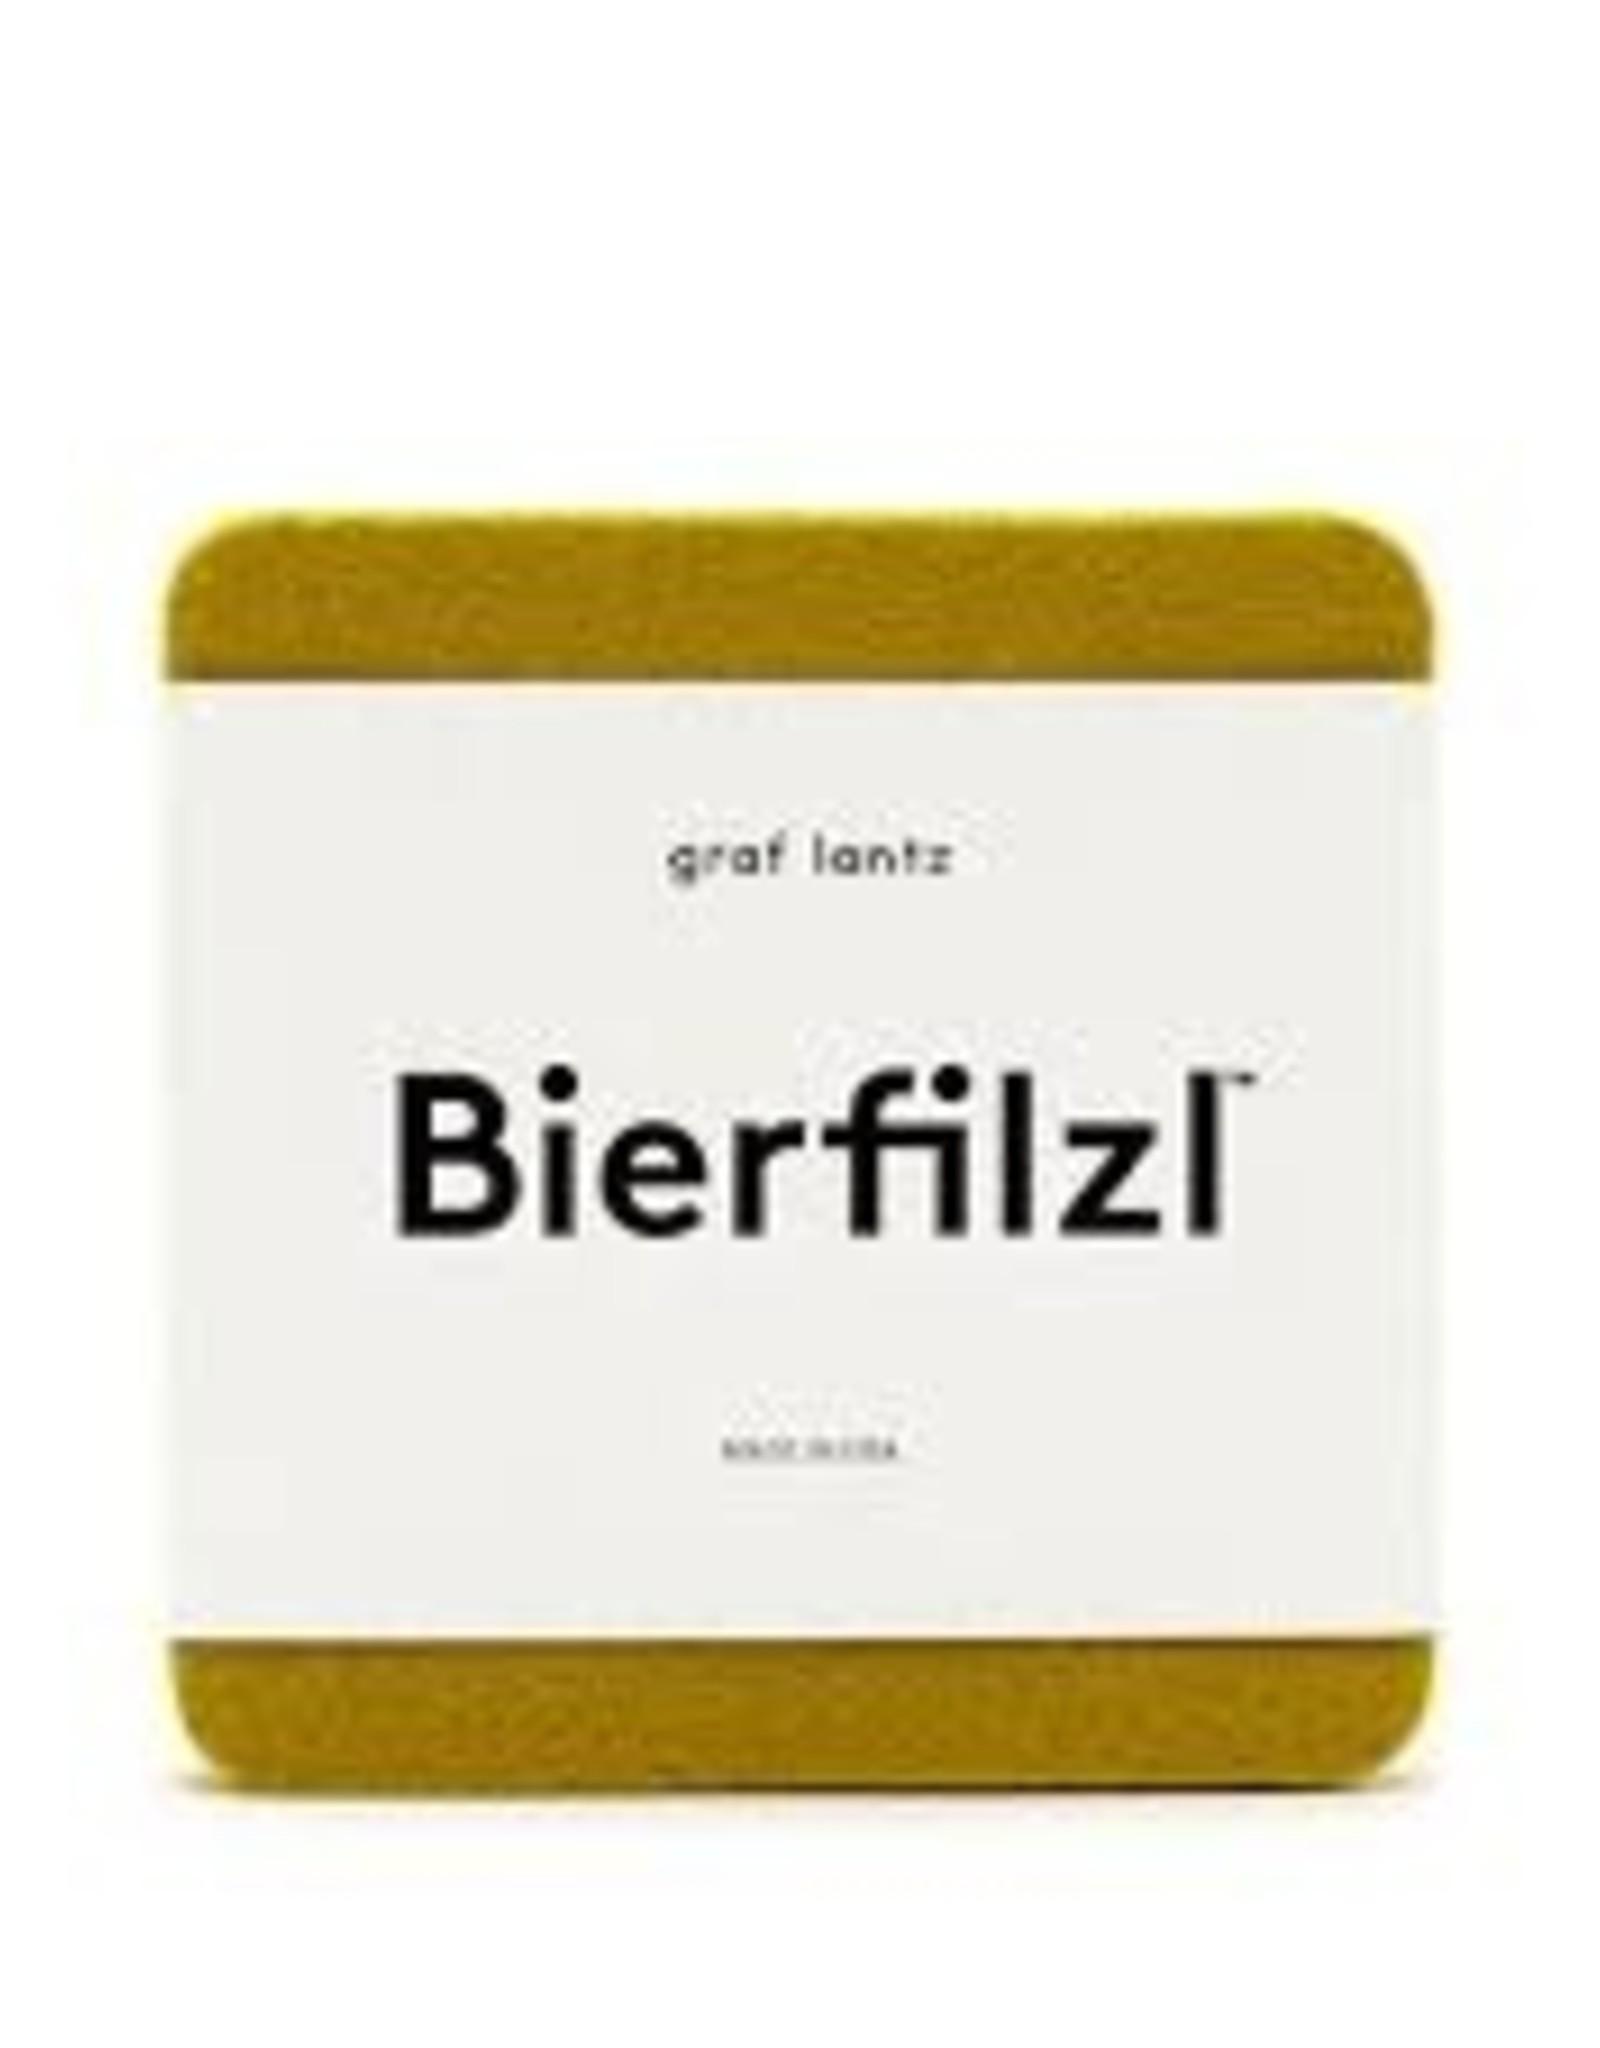 Graf&Lantz Bierfilzl Square Felt Coaster 4 Pack - Electric